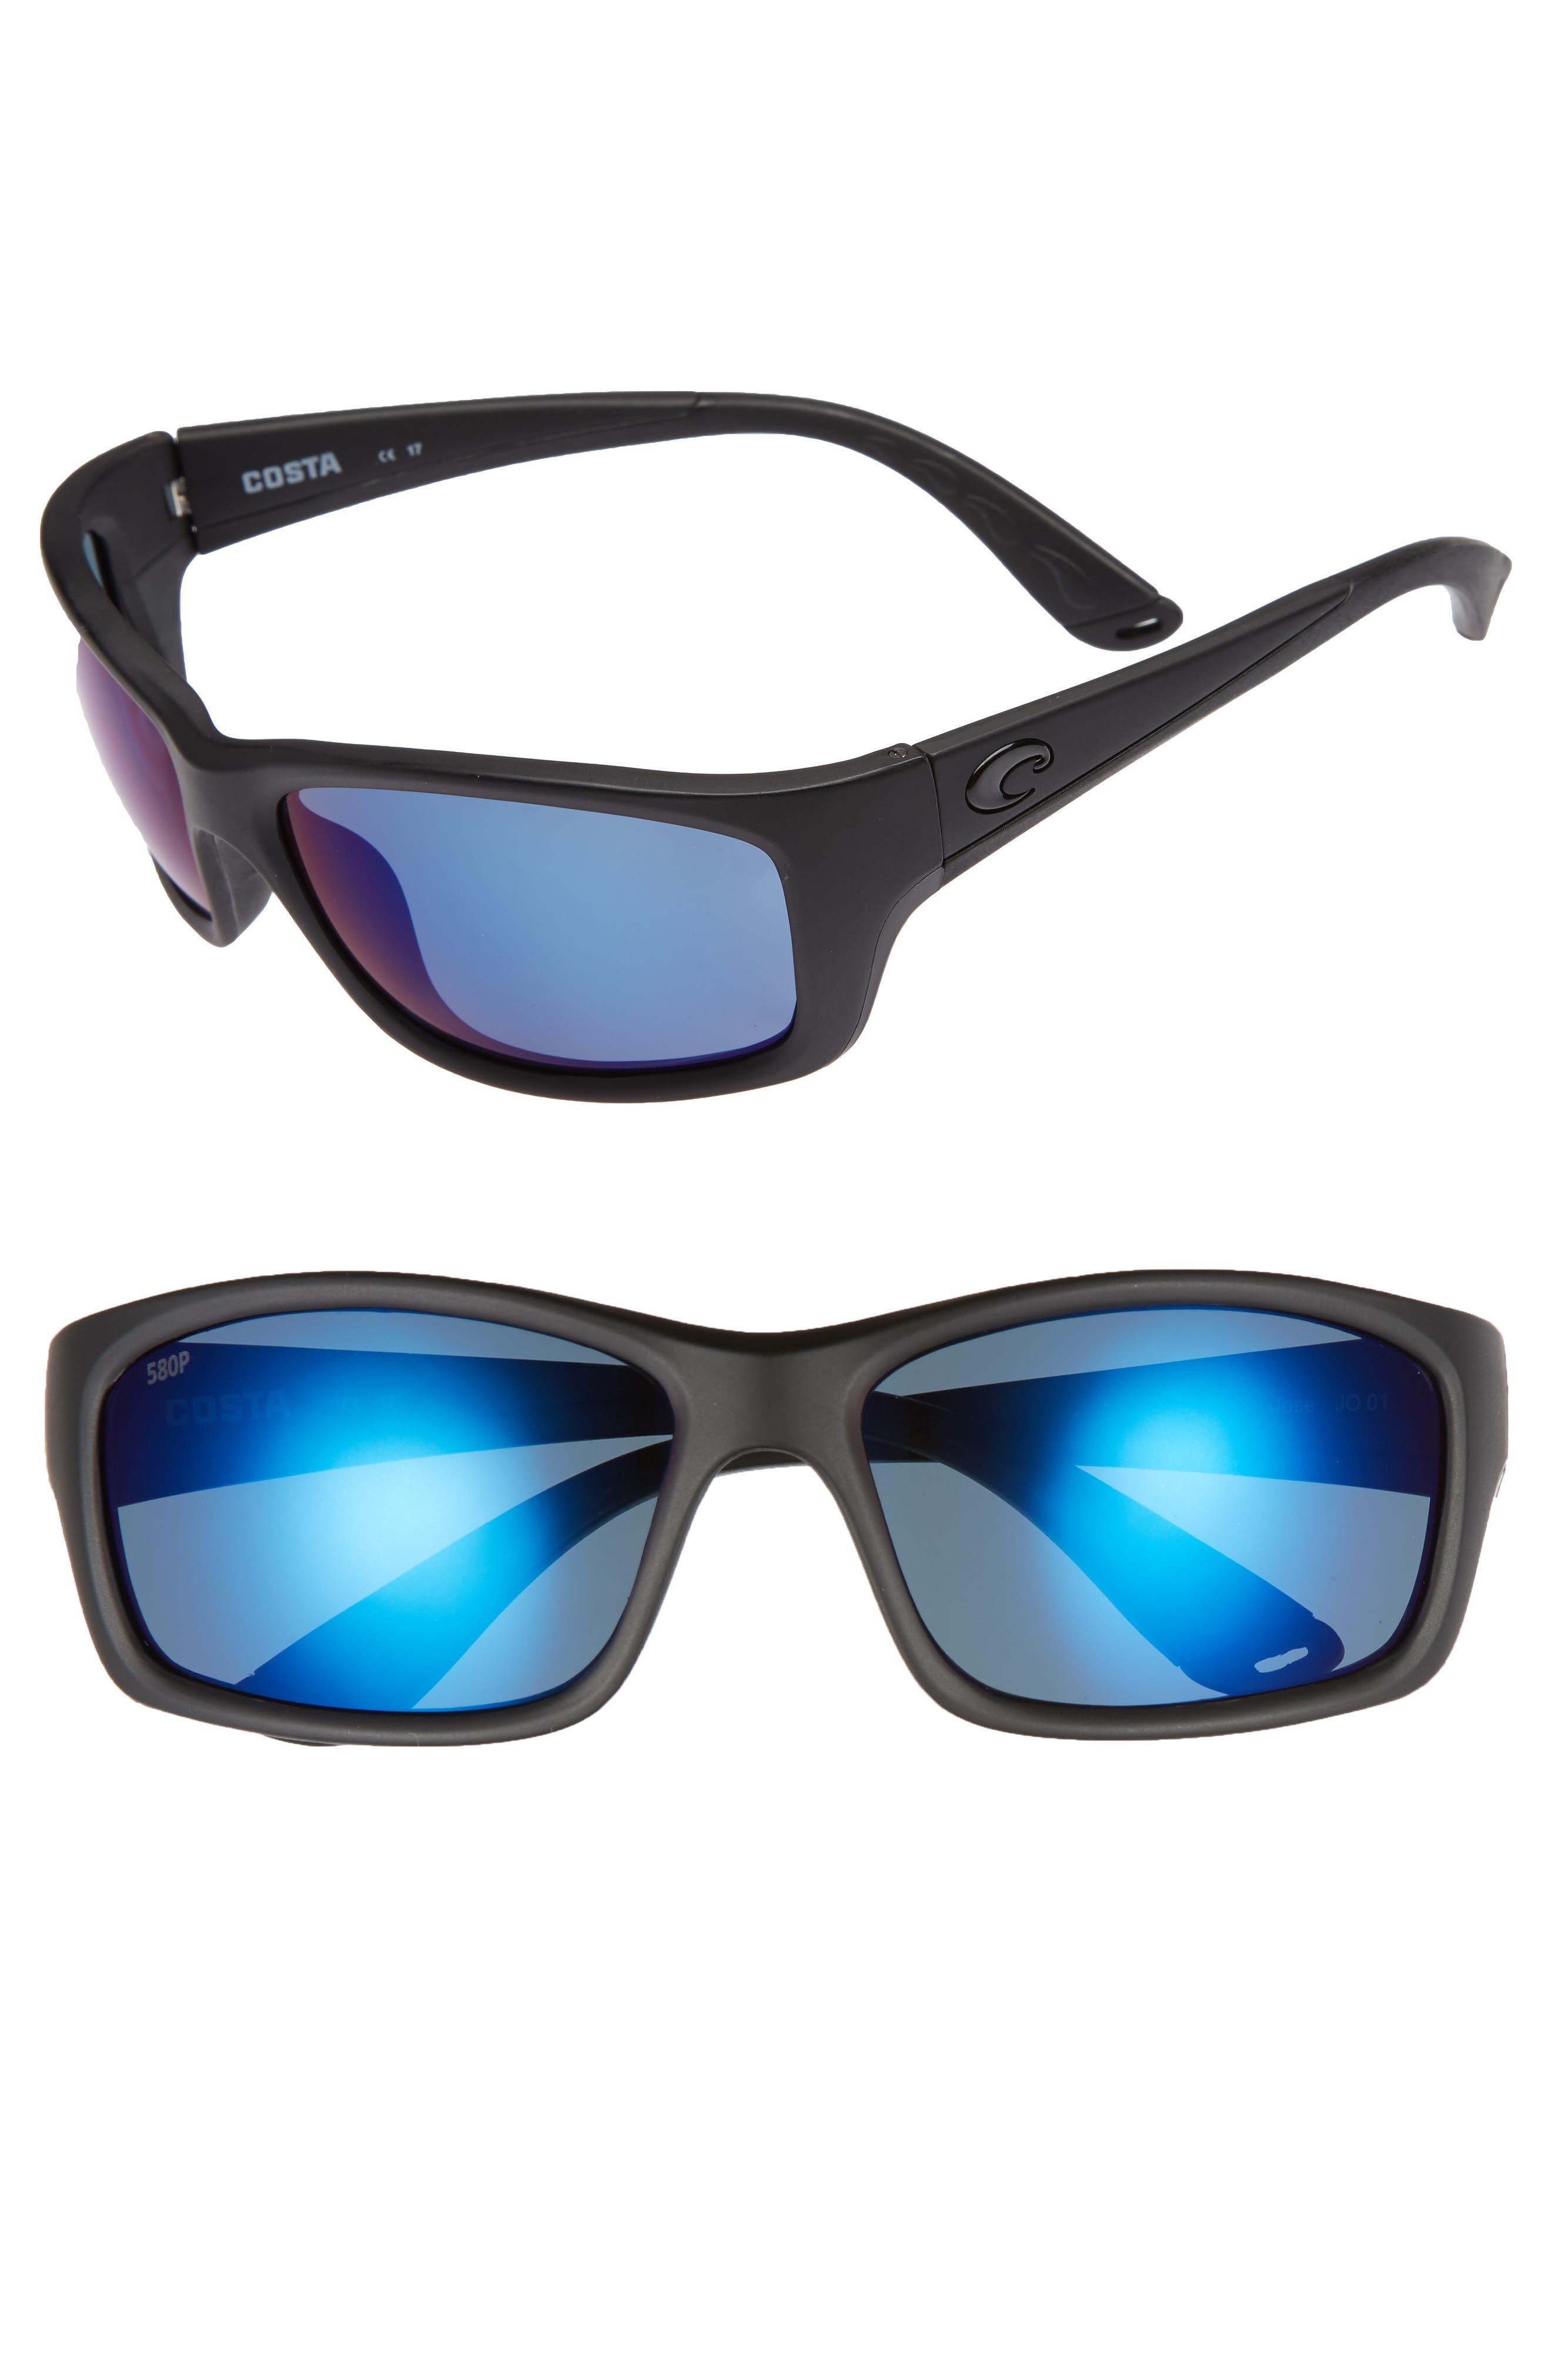 Jose 60mm Polarized Sunglasses,                             Main thumbnail 1, color,                             Blackout/ Blue Mirror